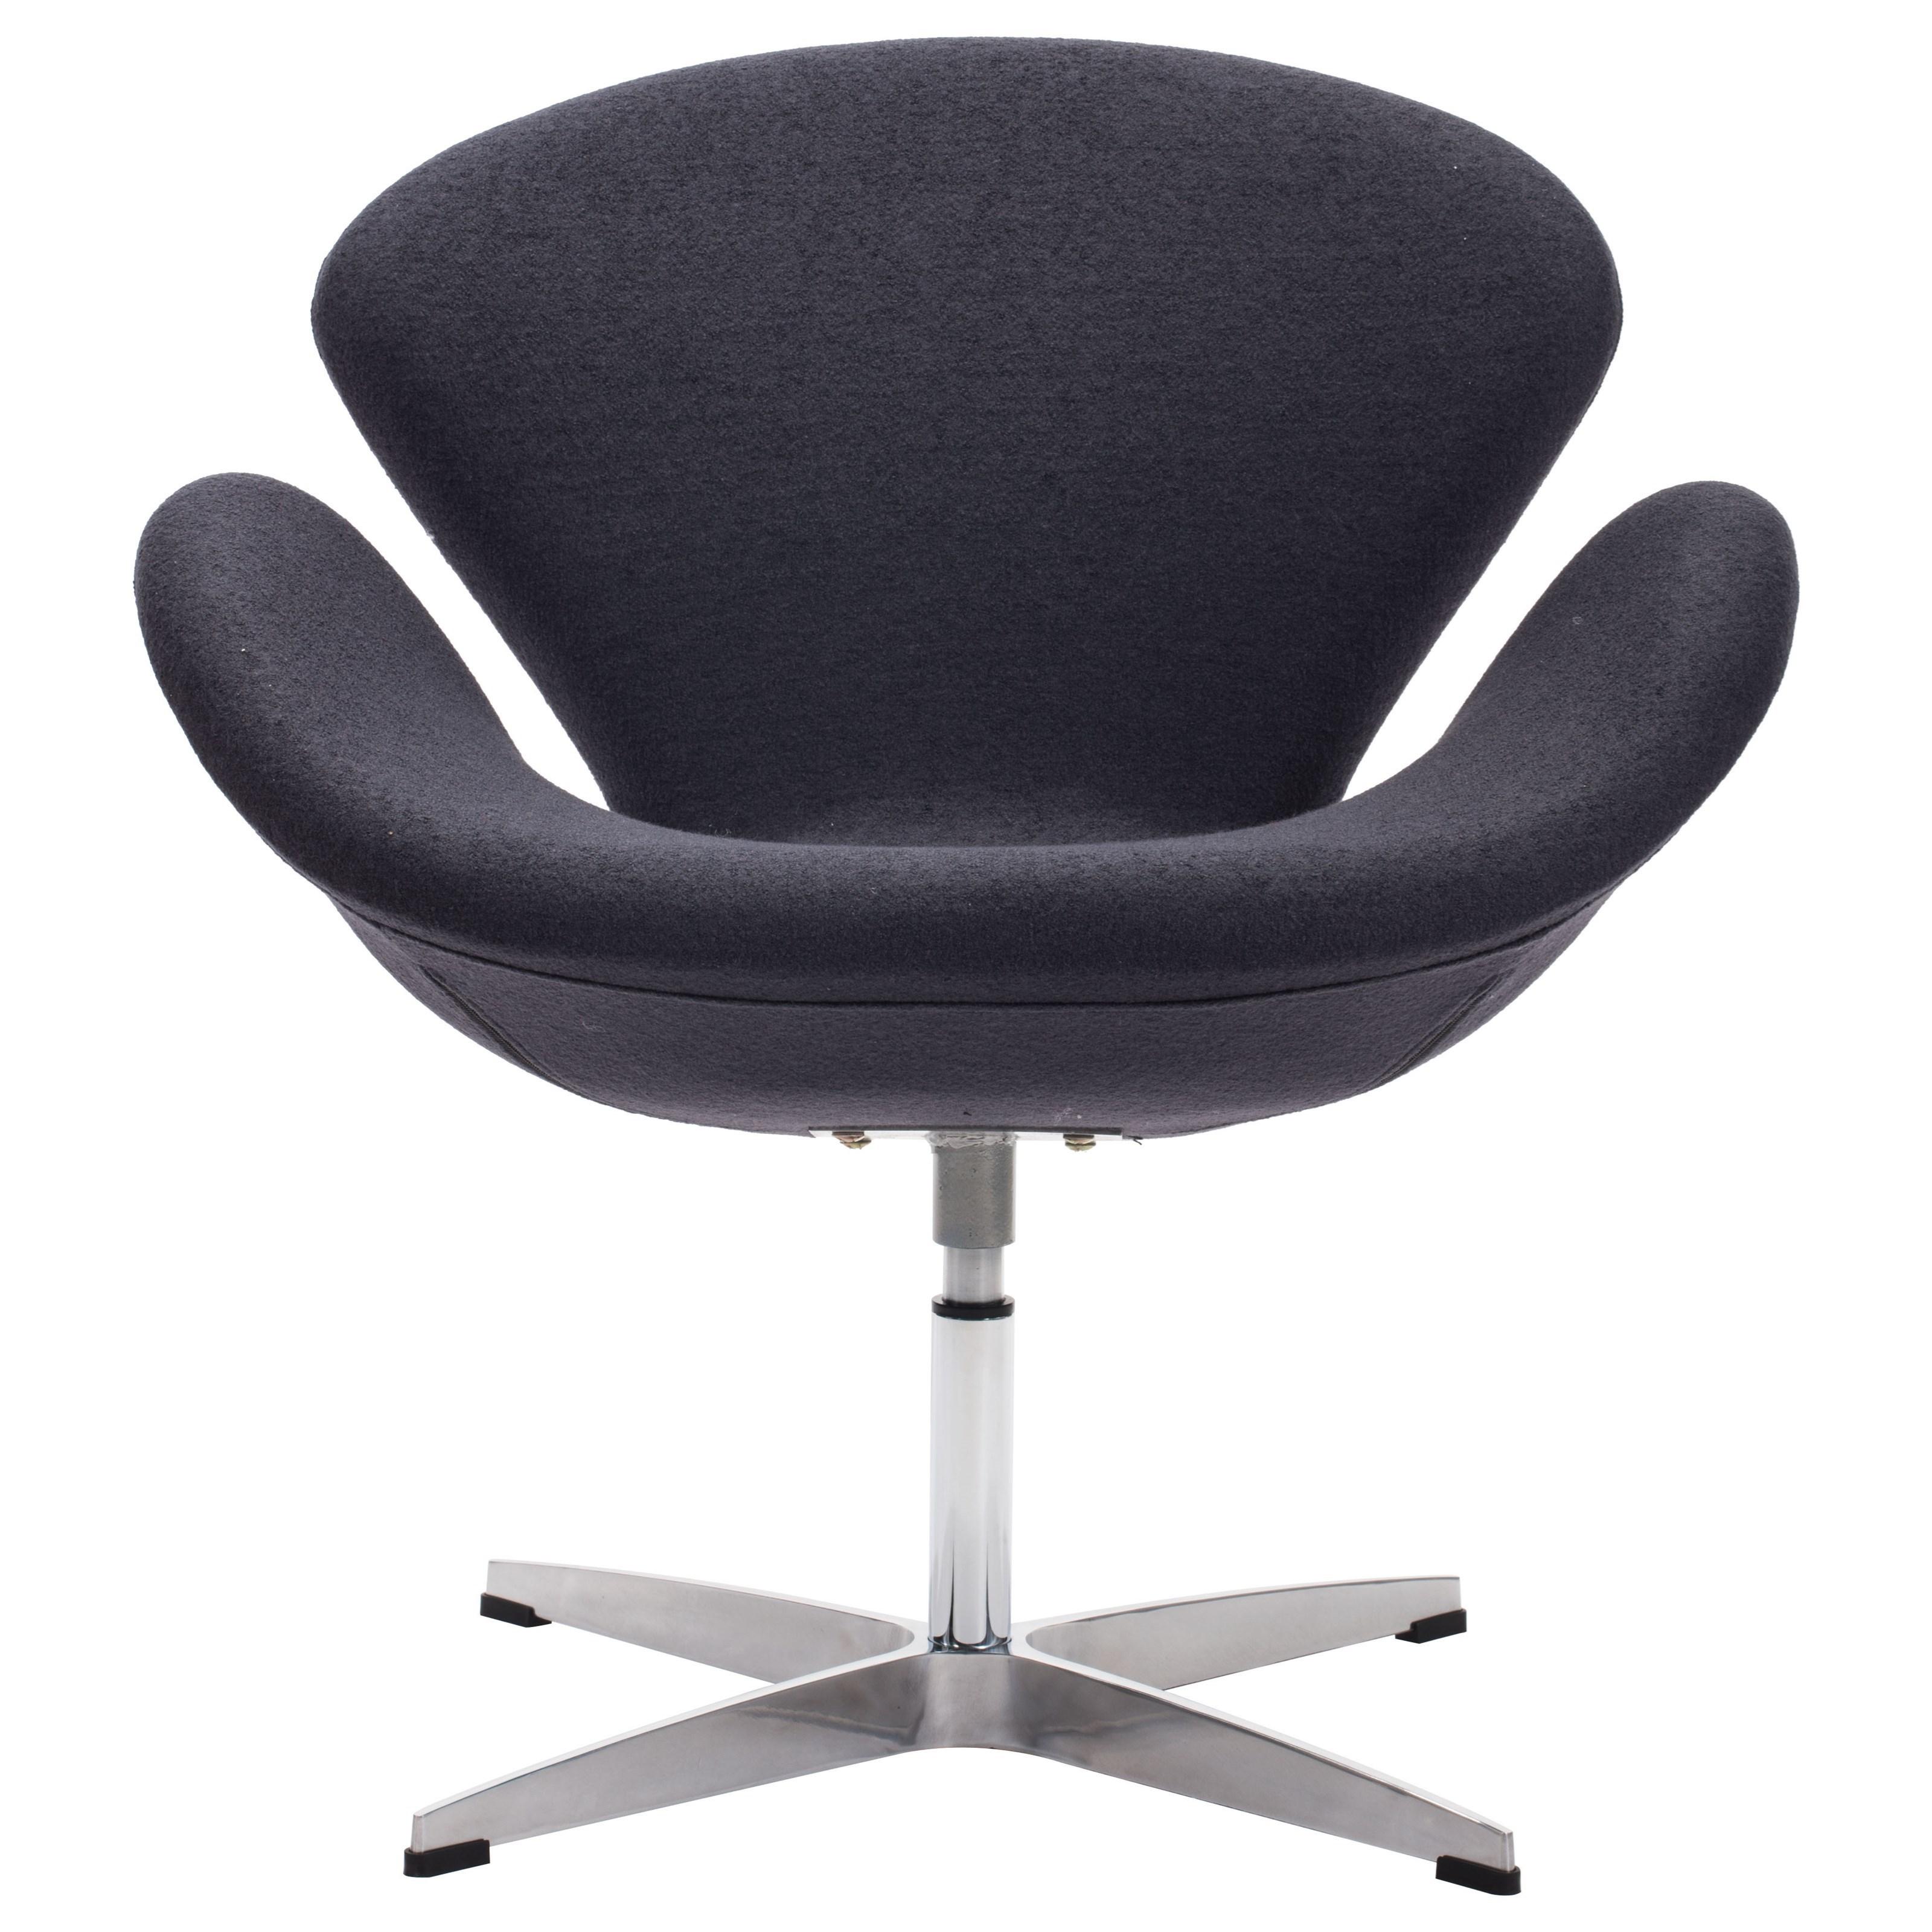 Pori Arm Chair by Zuo at Nassau Furniture and Mattress